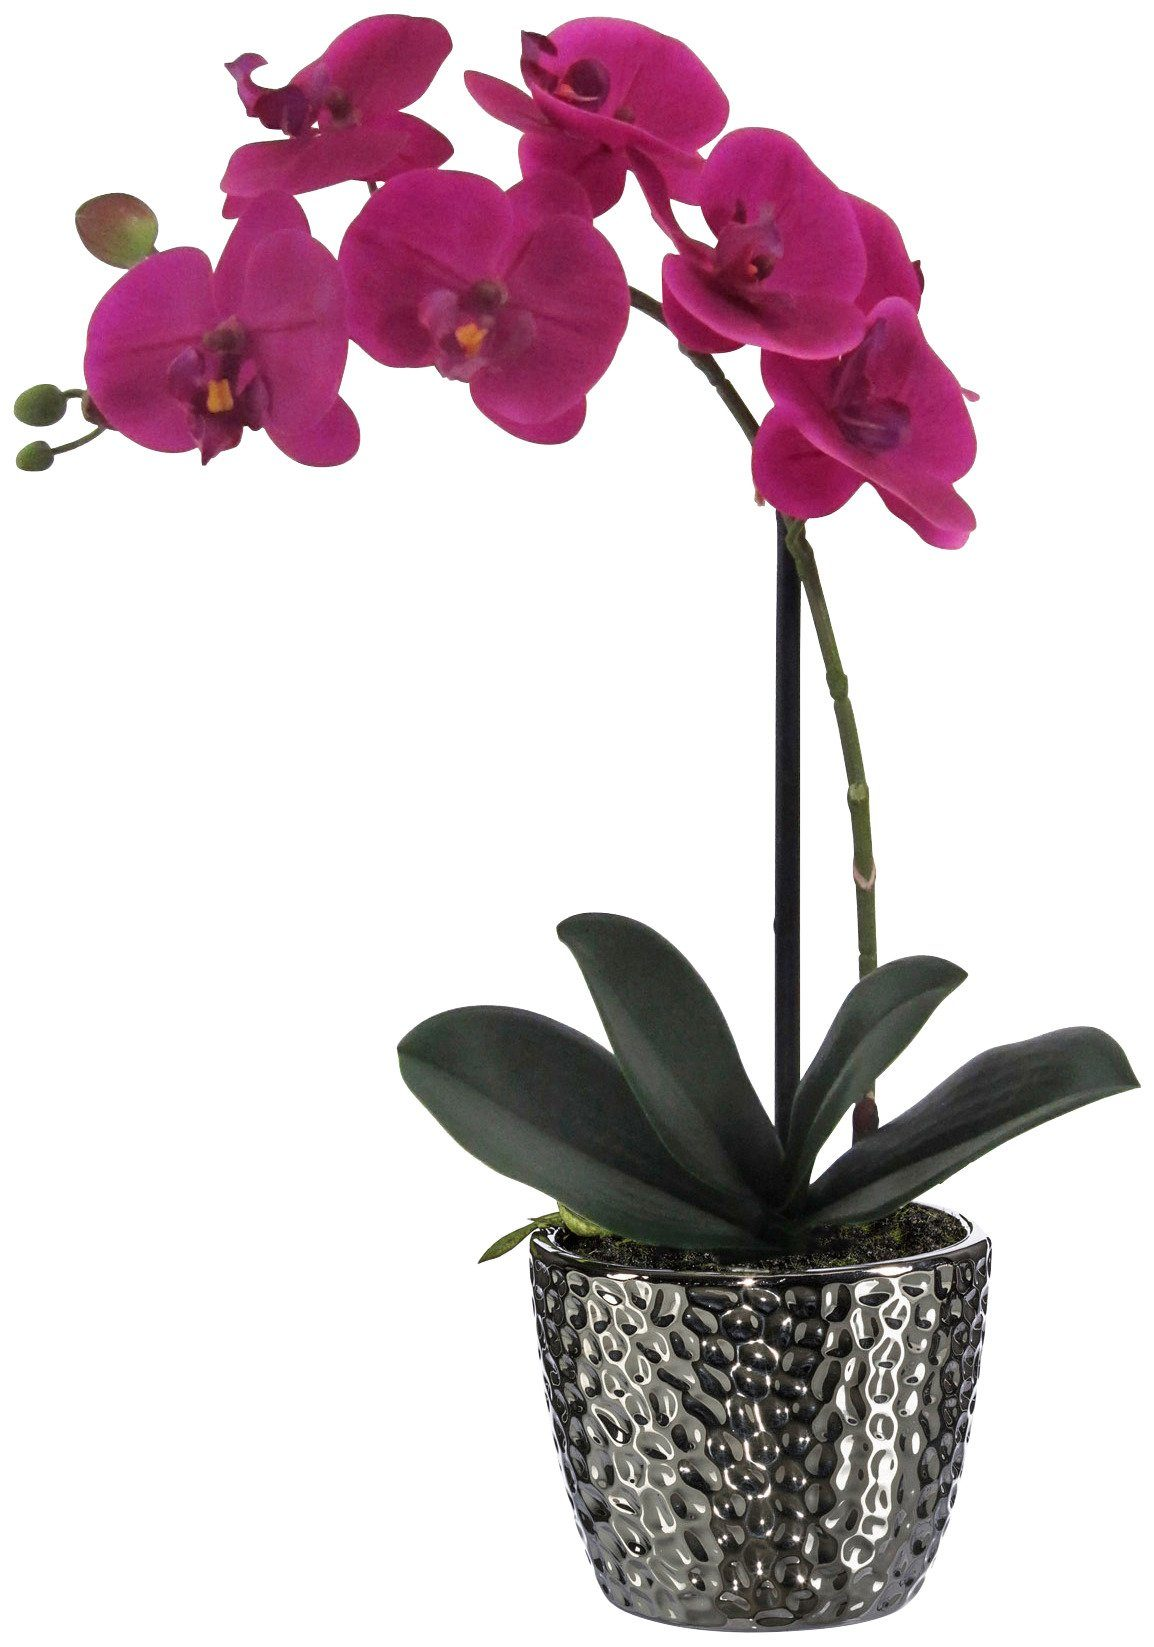 Kunstpflanze »Orchidee« lila inkl. Pflanzgefäß (H: 45 cm)